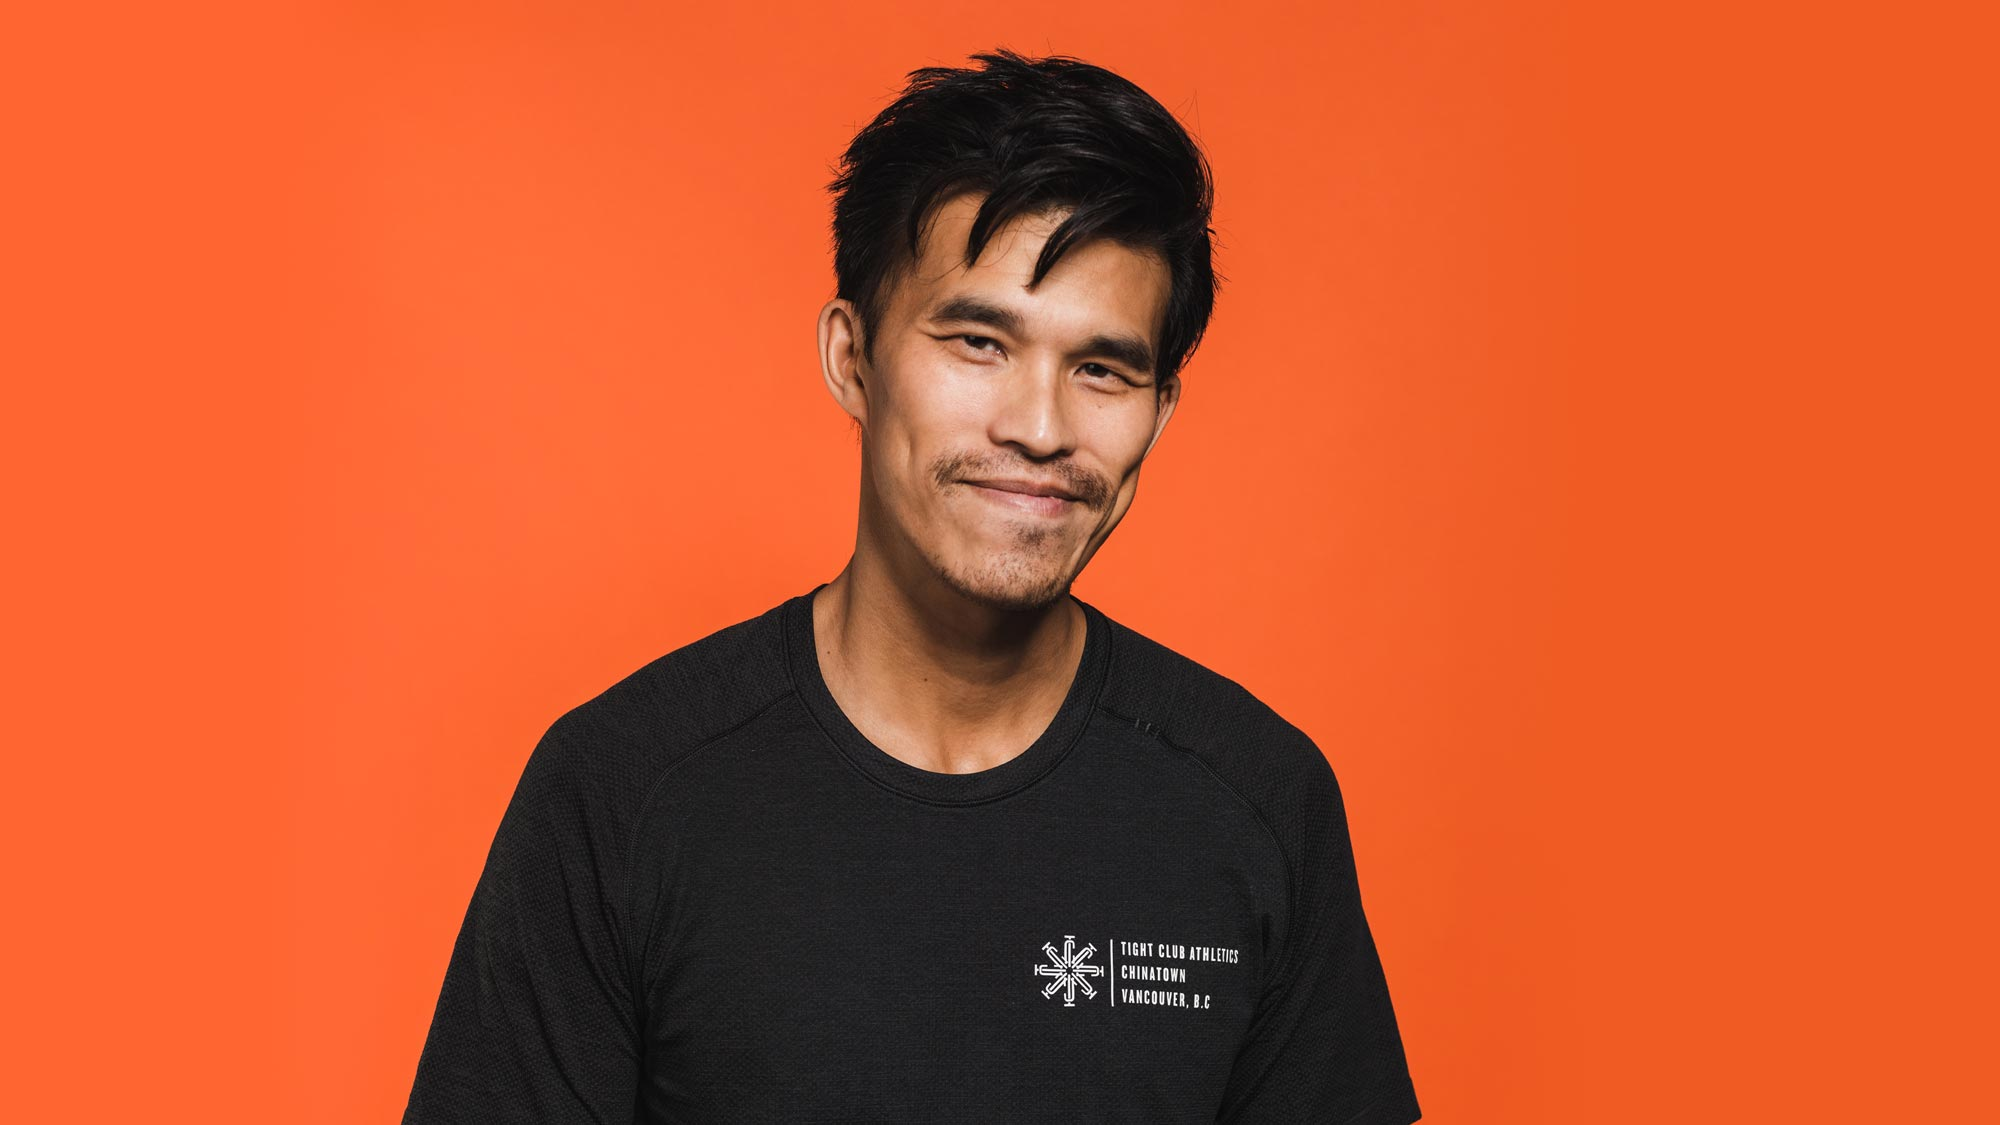 Tight Club Athletics - Warren Chow - Personal Trainer, Team Coach. He Him.